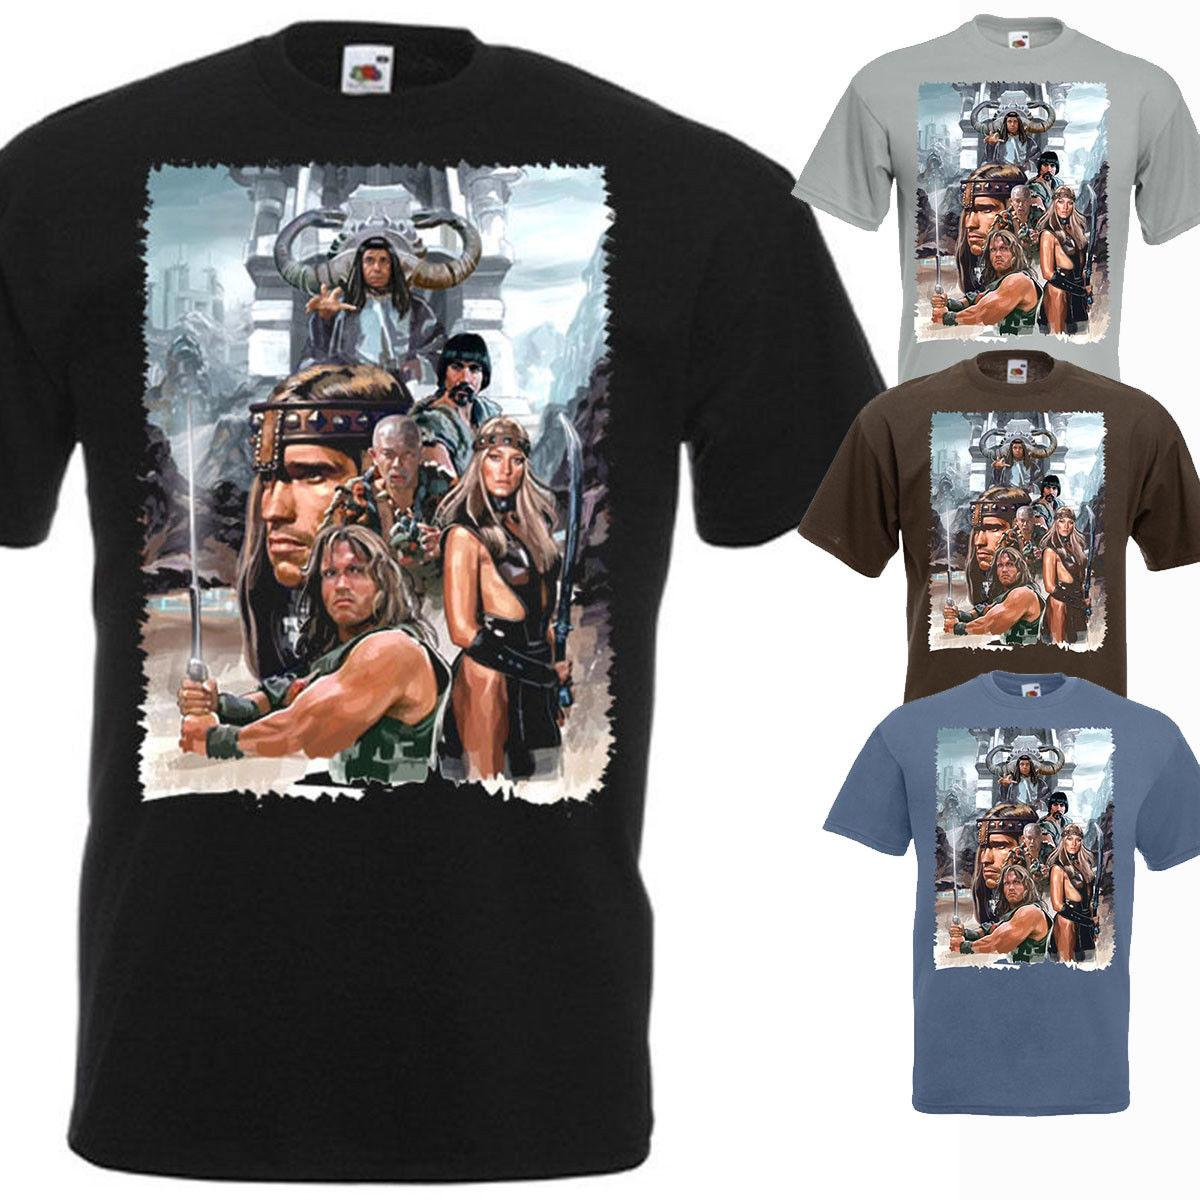 f1c9f4b4ccc Conan The Barbarian T Shirt V1 Zink Black White Brown Movie Poster All  Sizes Tee Shirt Men Man S Best Deals Custom Short Sleeve Plus T Shirts  Shopping ...